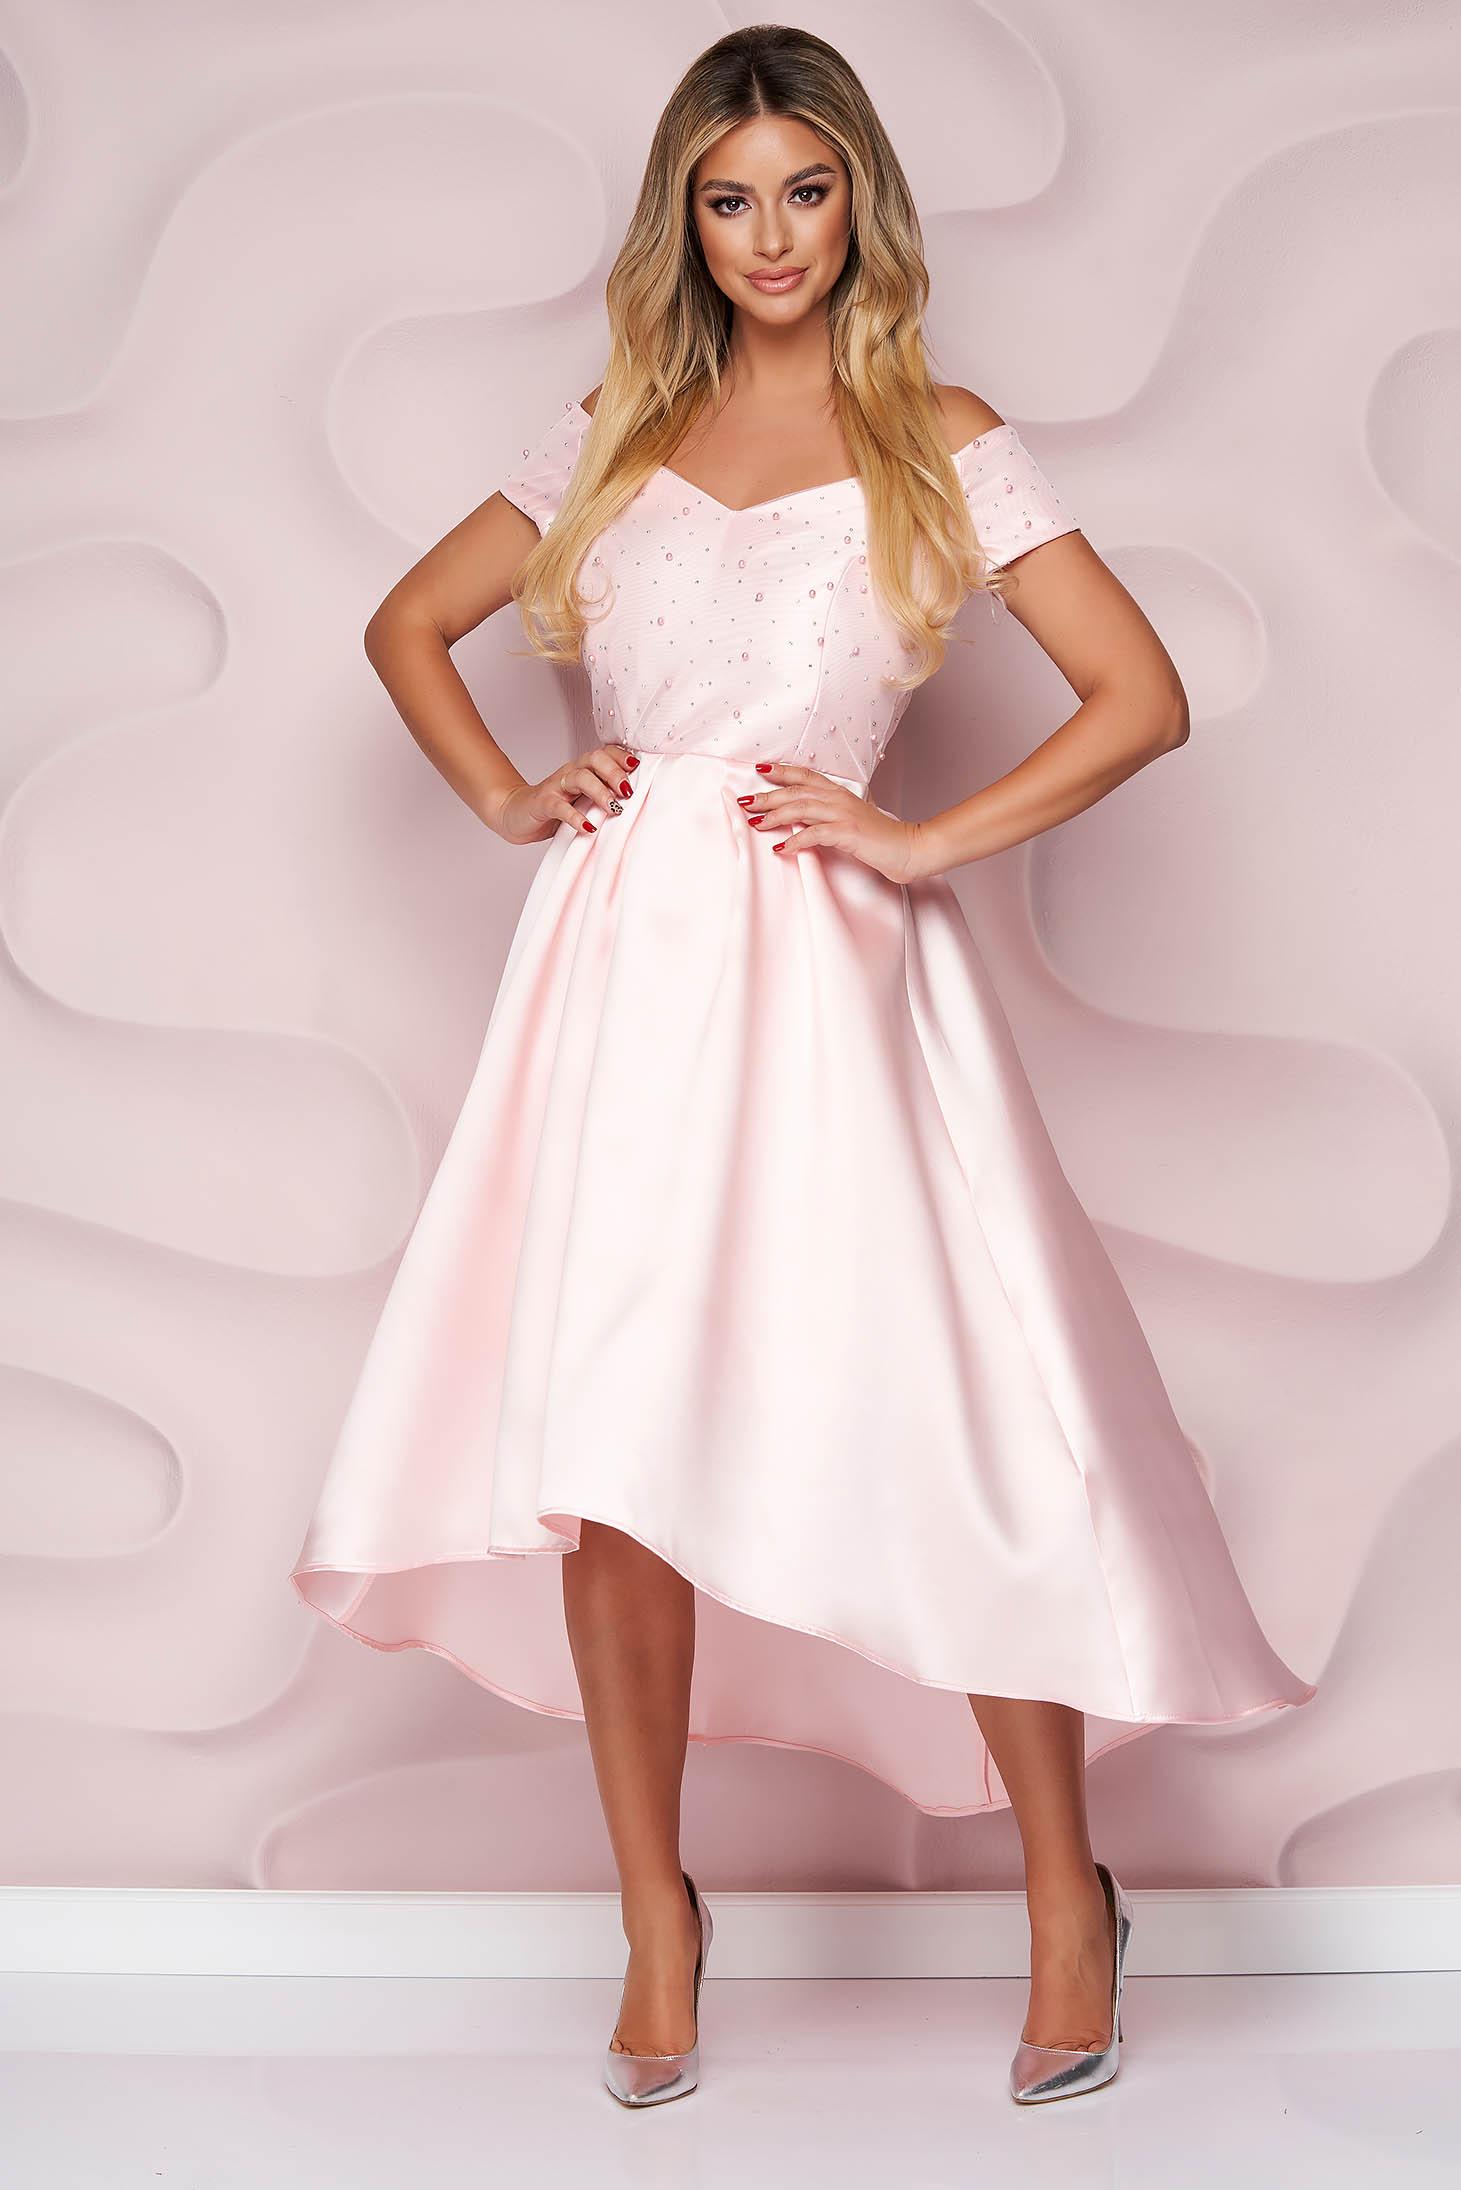 Rochie StarShinerS roz deschis de ocazie in clos asimetrica din material gros cu aplicatii cu perle si pietre strass